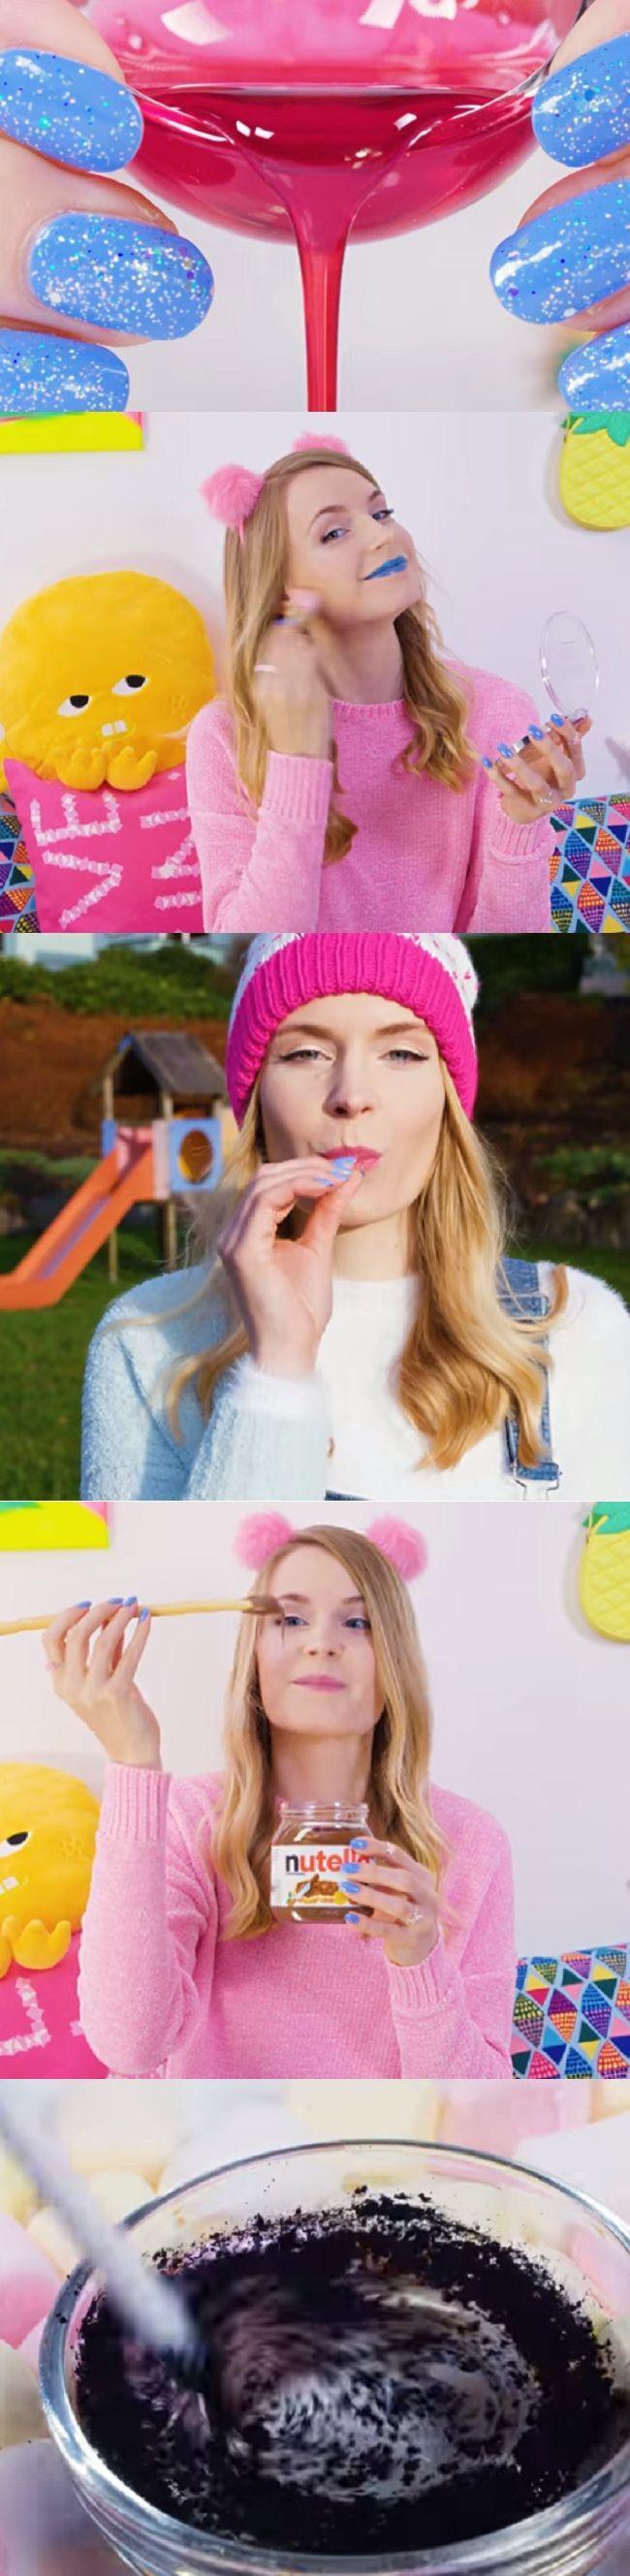 DIY Edible Makeup Pranks! DIY Makeup Tutorial with 10 Funny Pranks and Life Hack...